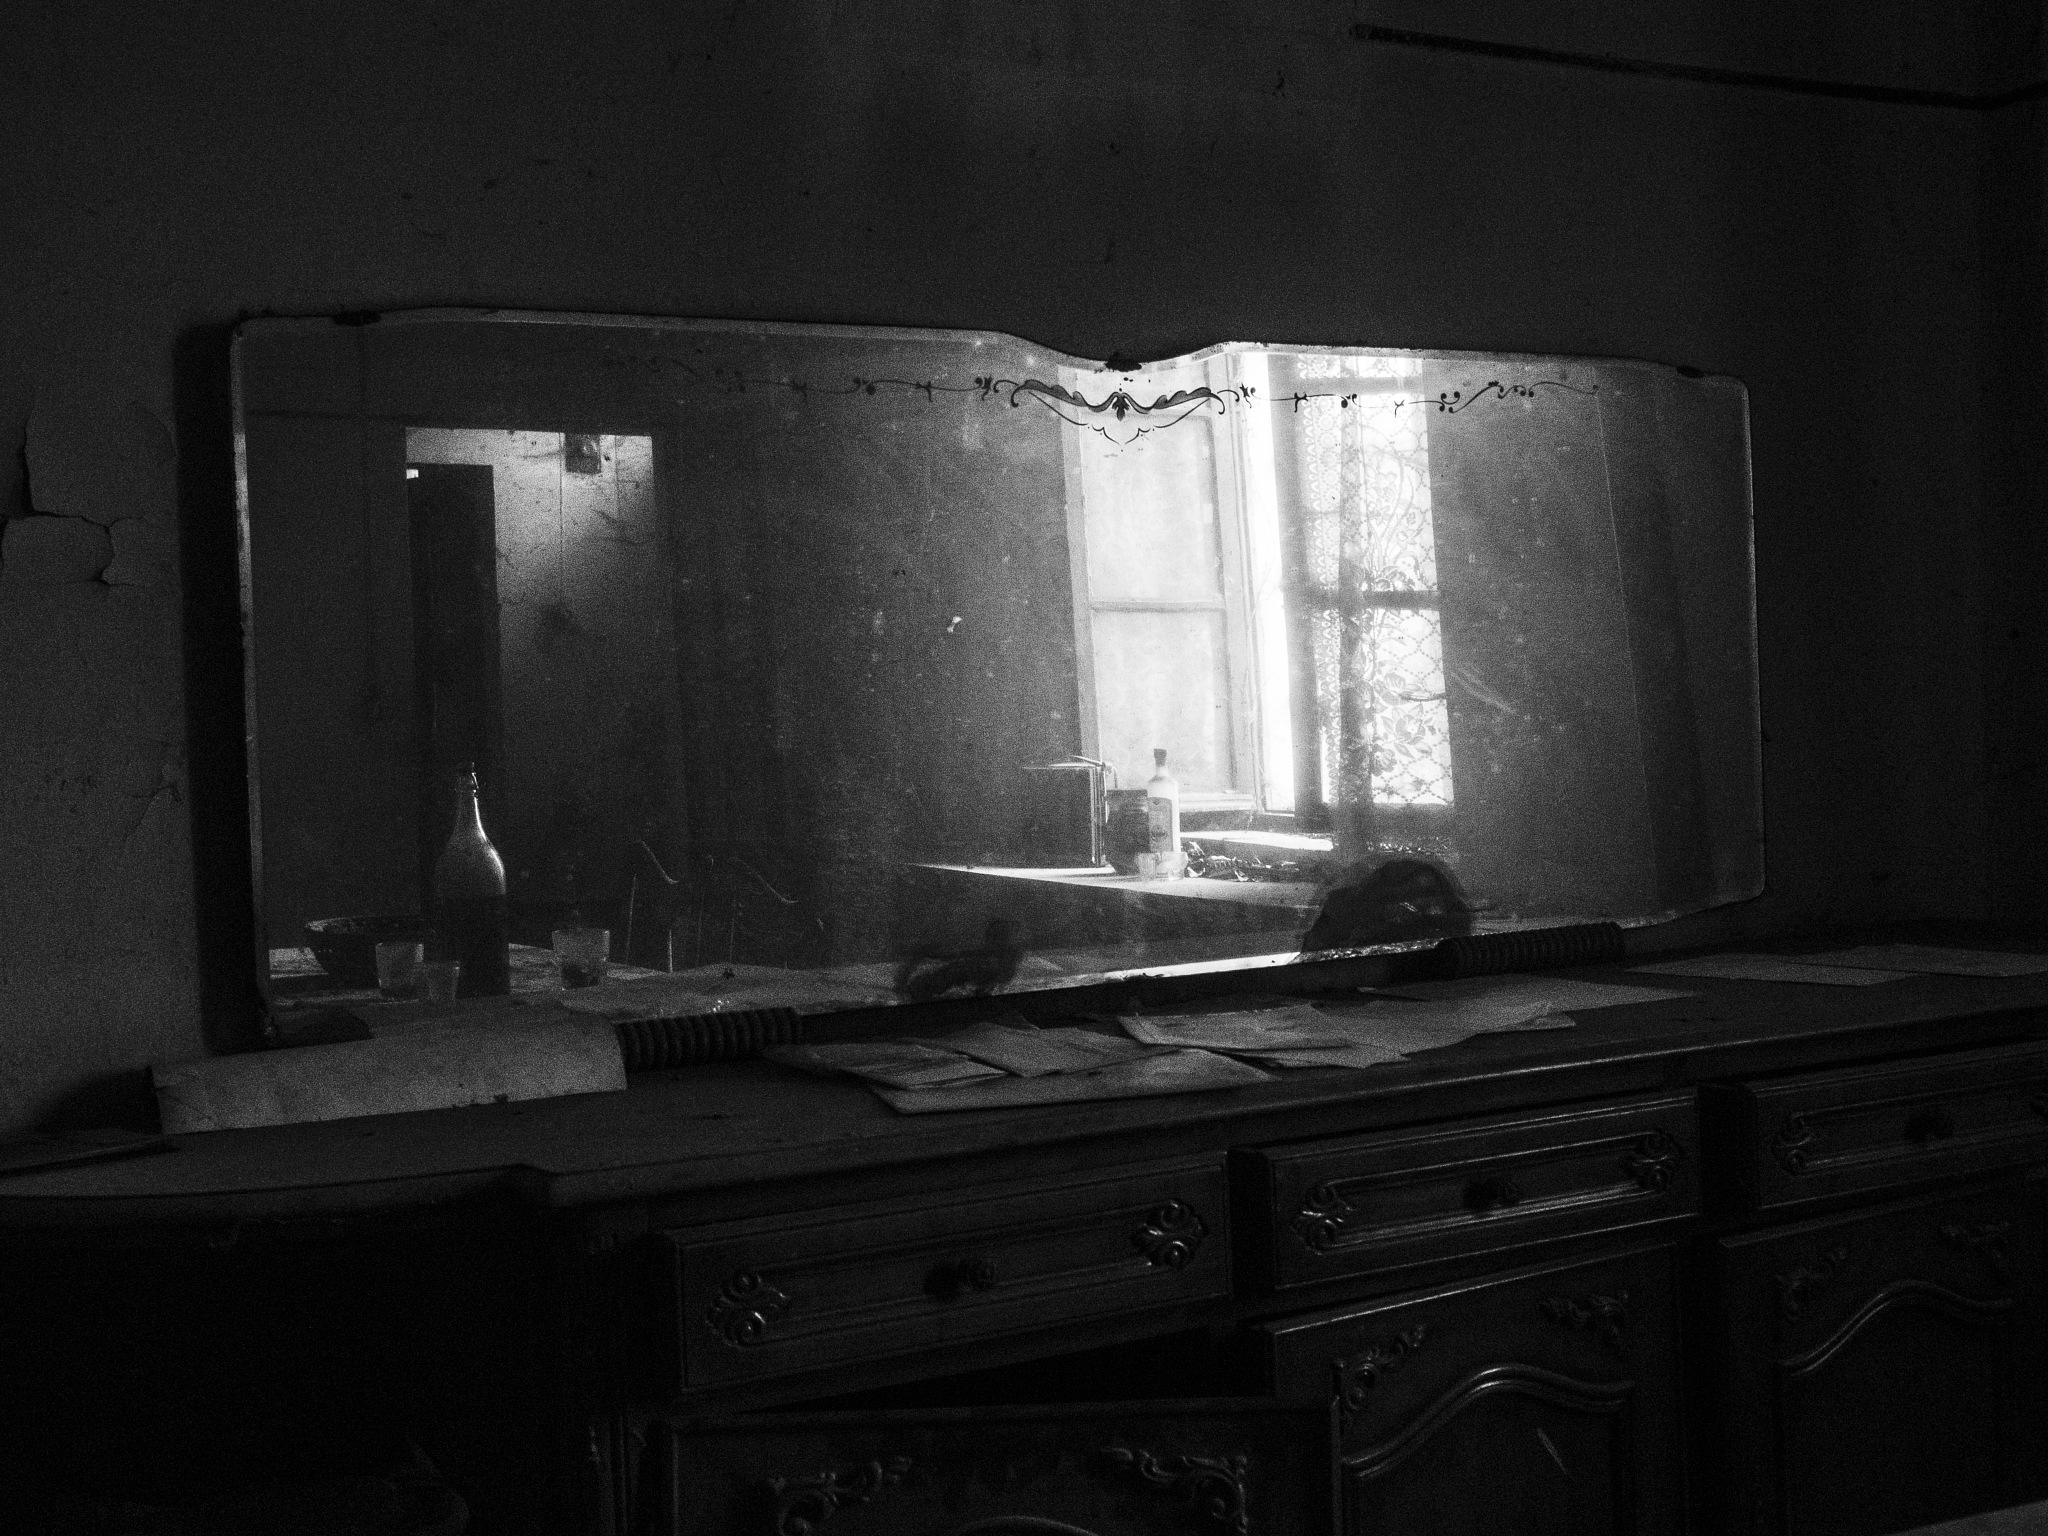 Reflections by gabriele.zucchella